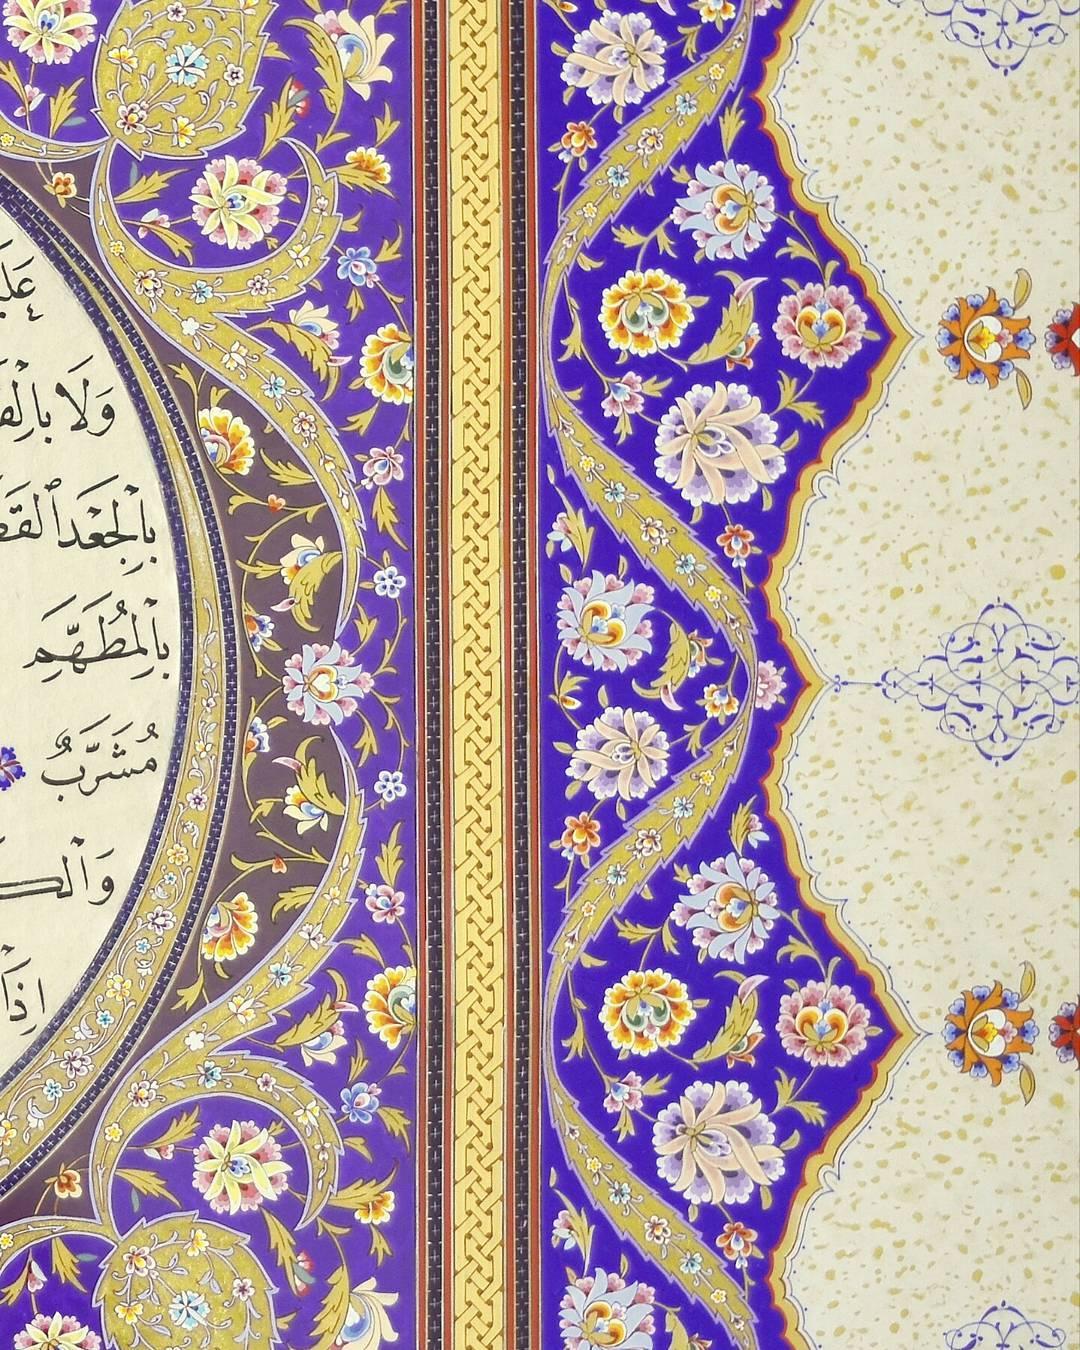 Khat Diwani Ajhalawani/Amr جزء من زخرفة اوزباكستانية لحلية كتبتها… 189